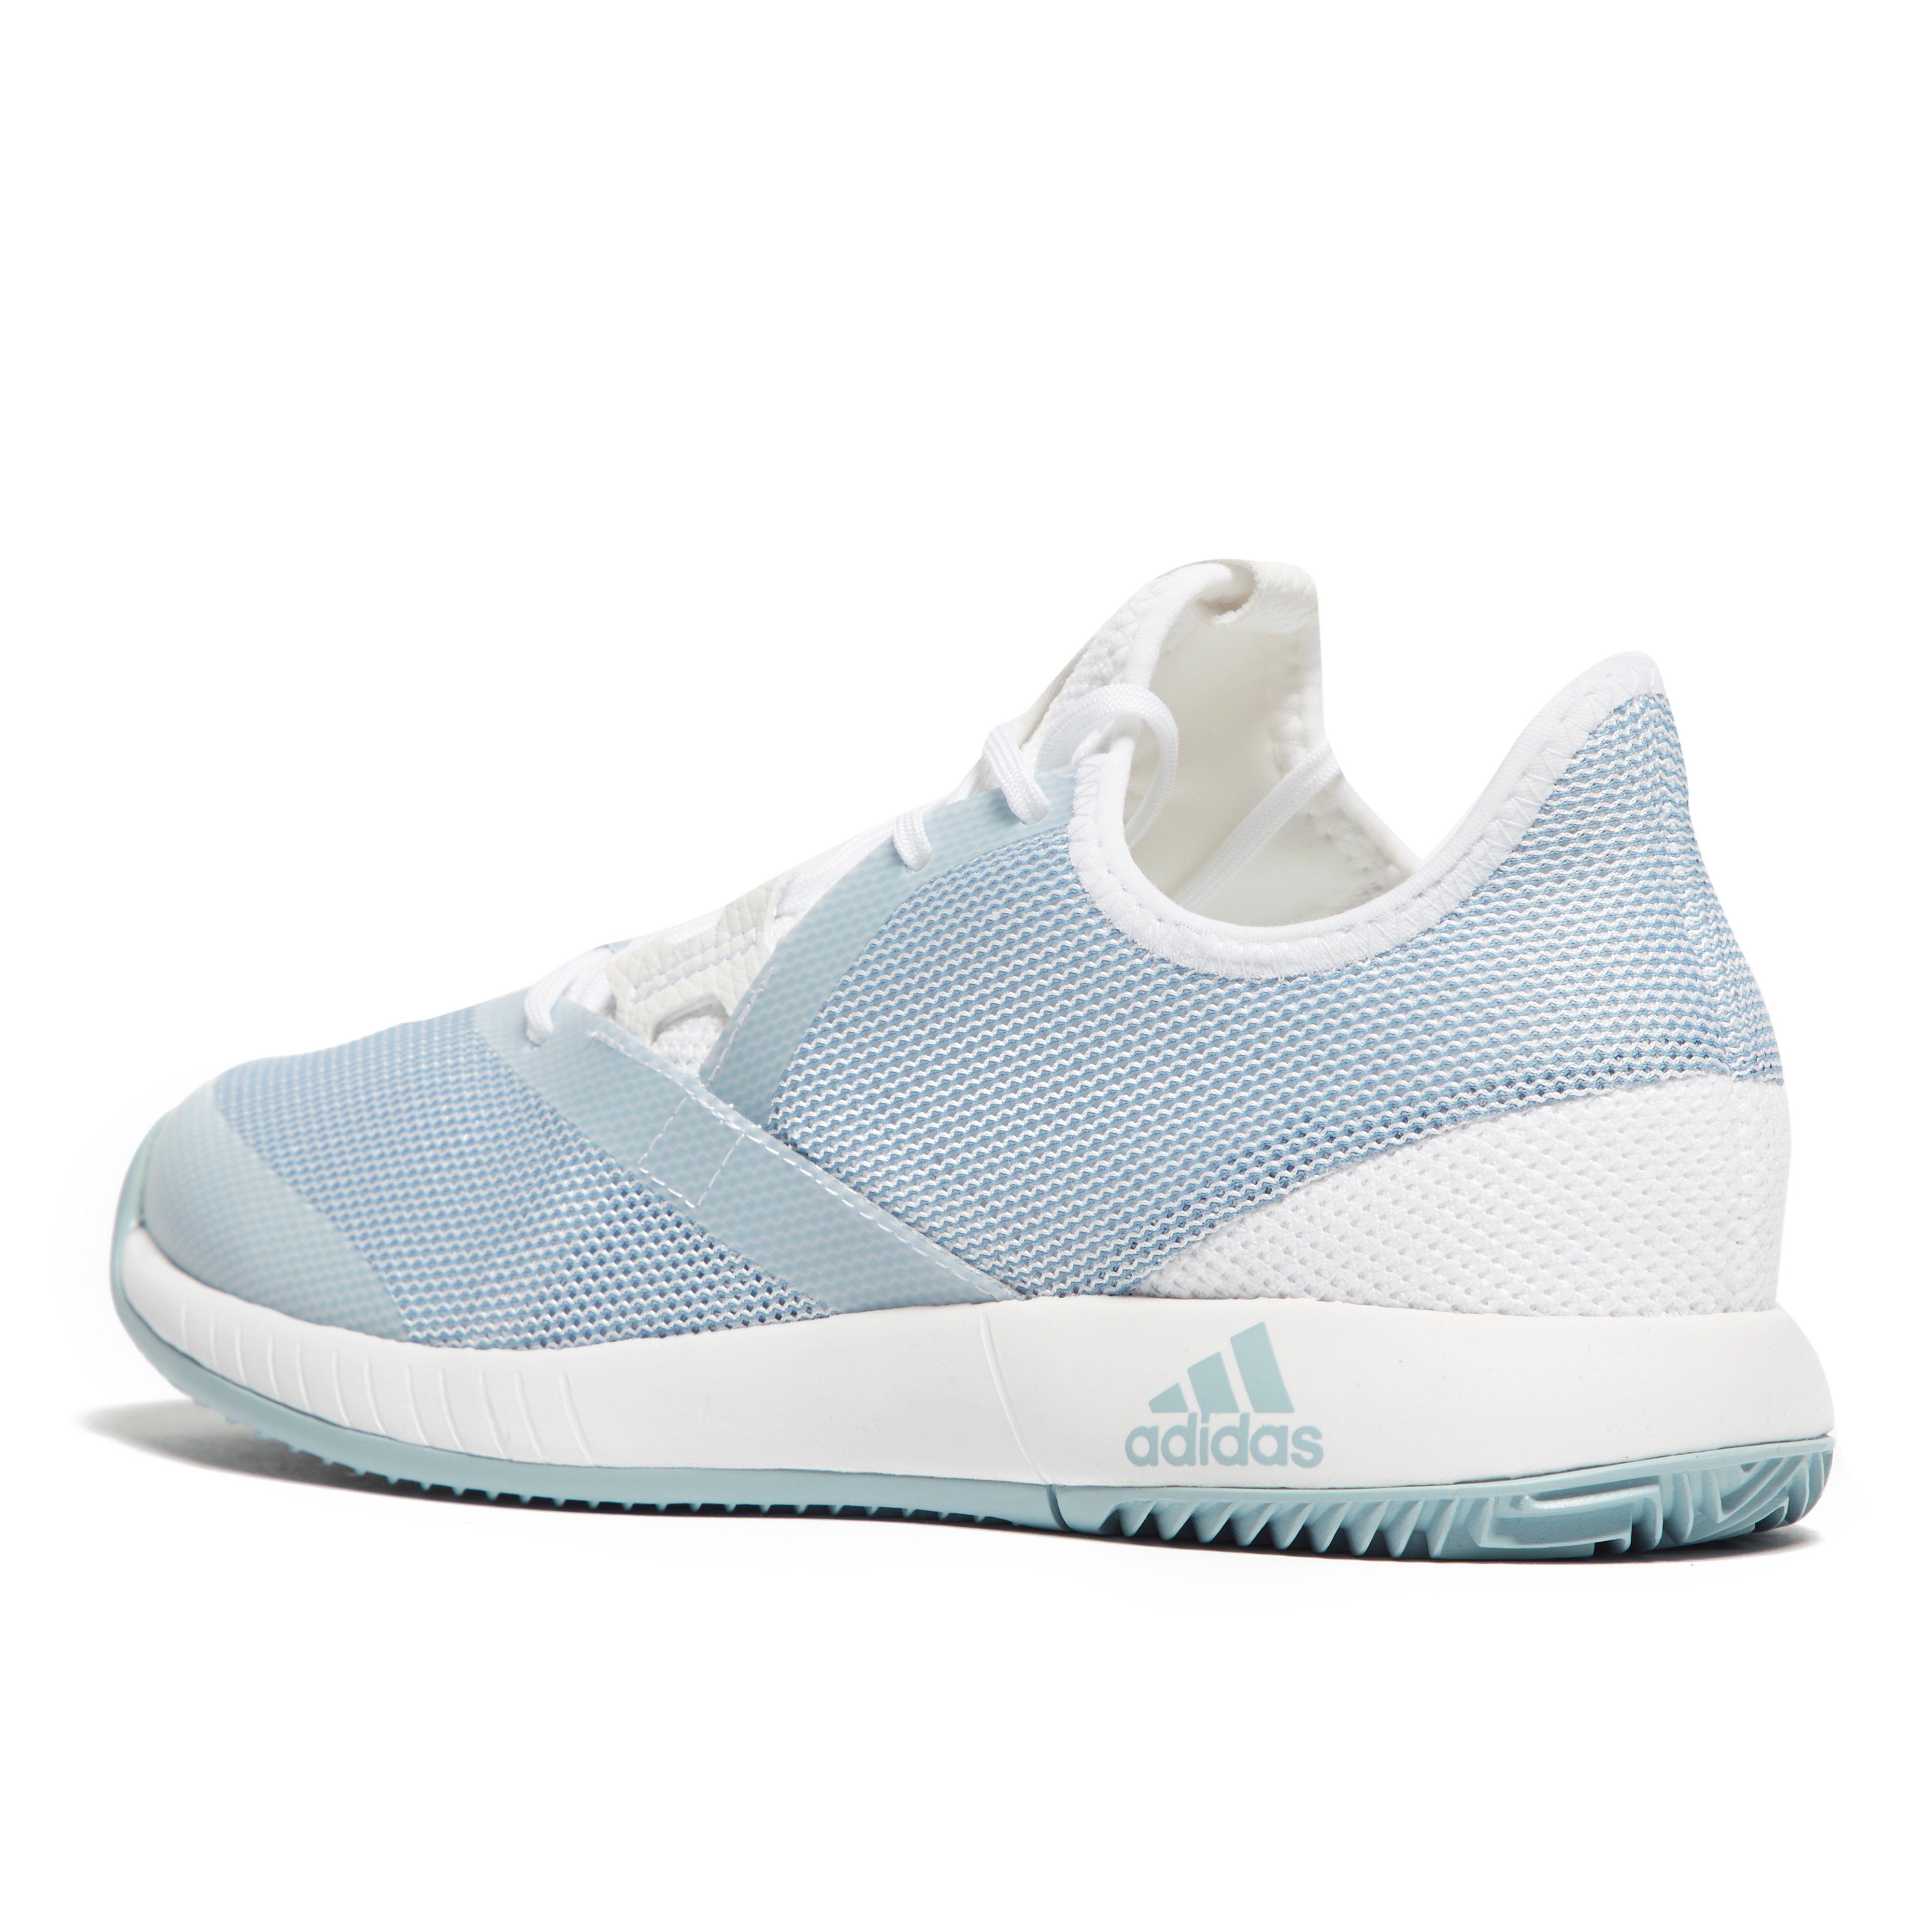 adidas Adizero Defiant Bounce Women's Tennis Shoes